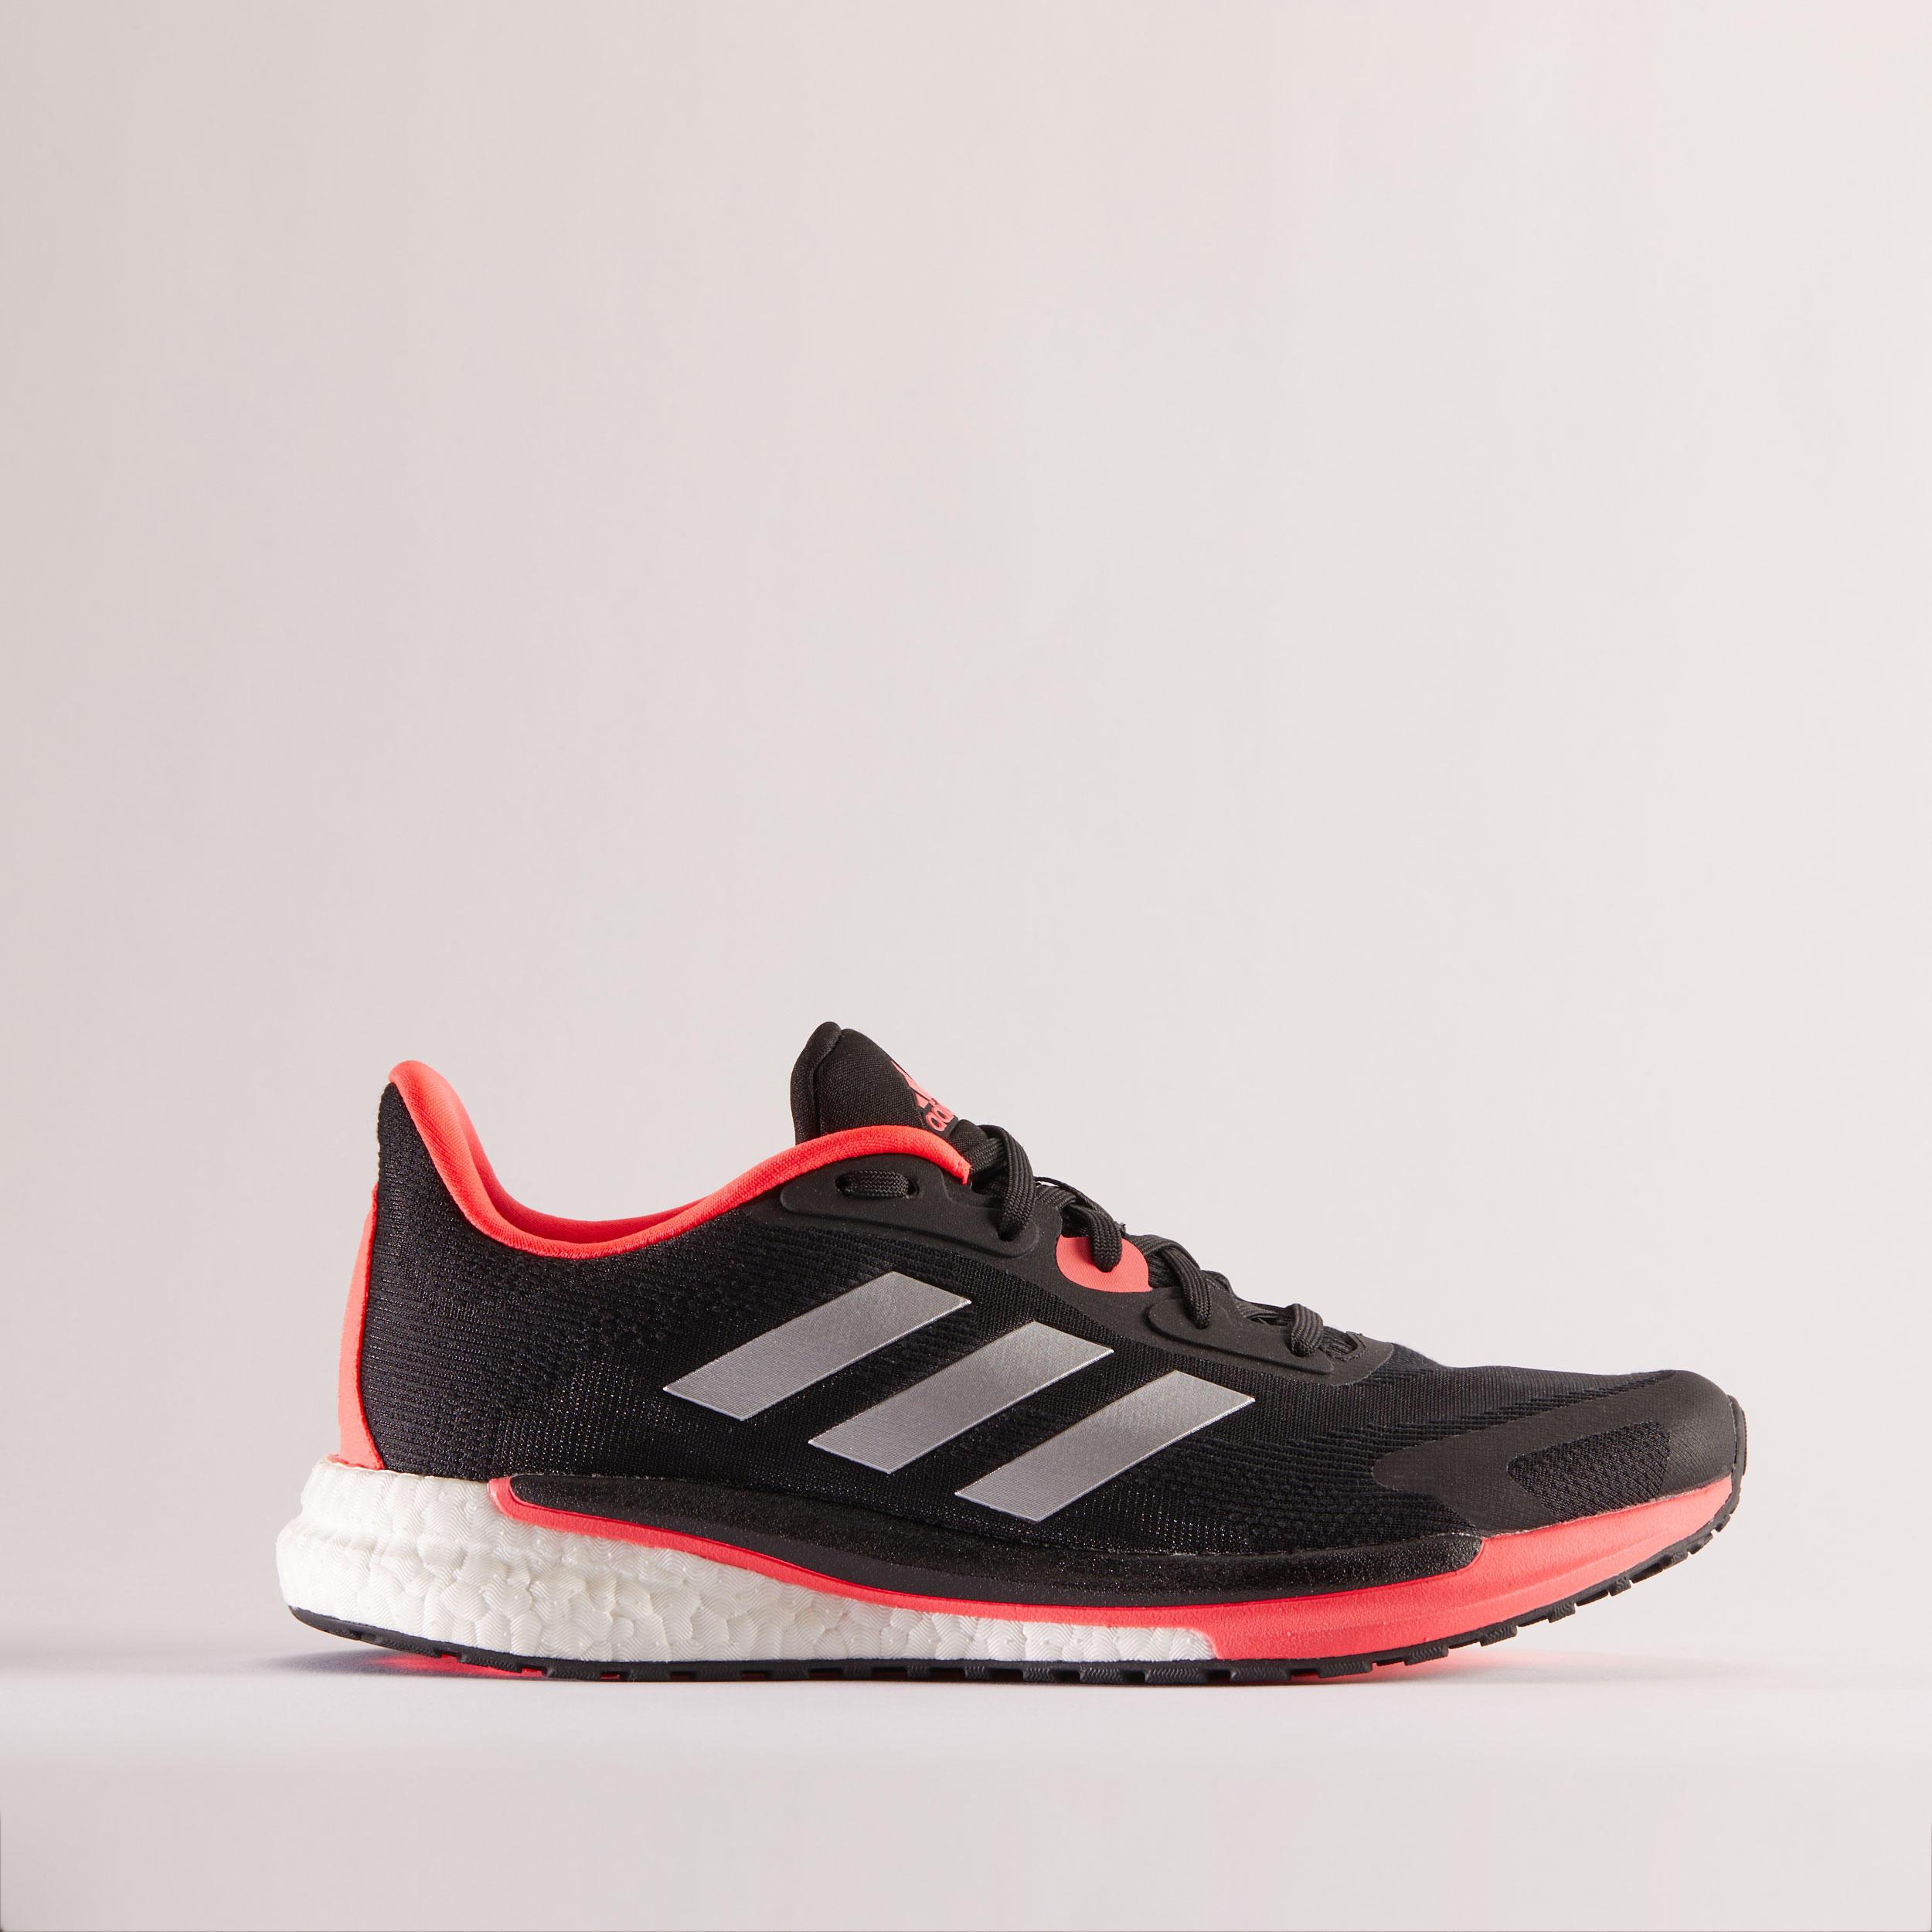 Chaussures running femme Adidas | Decathlon